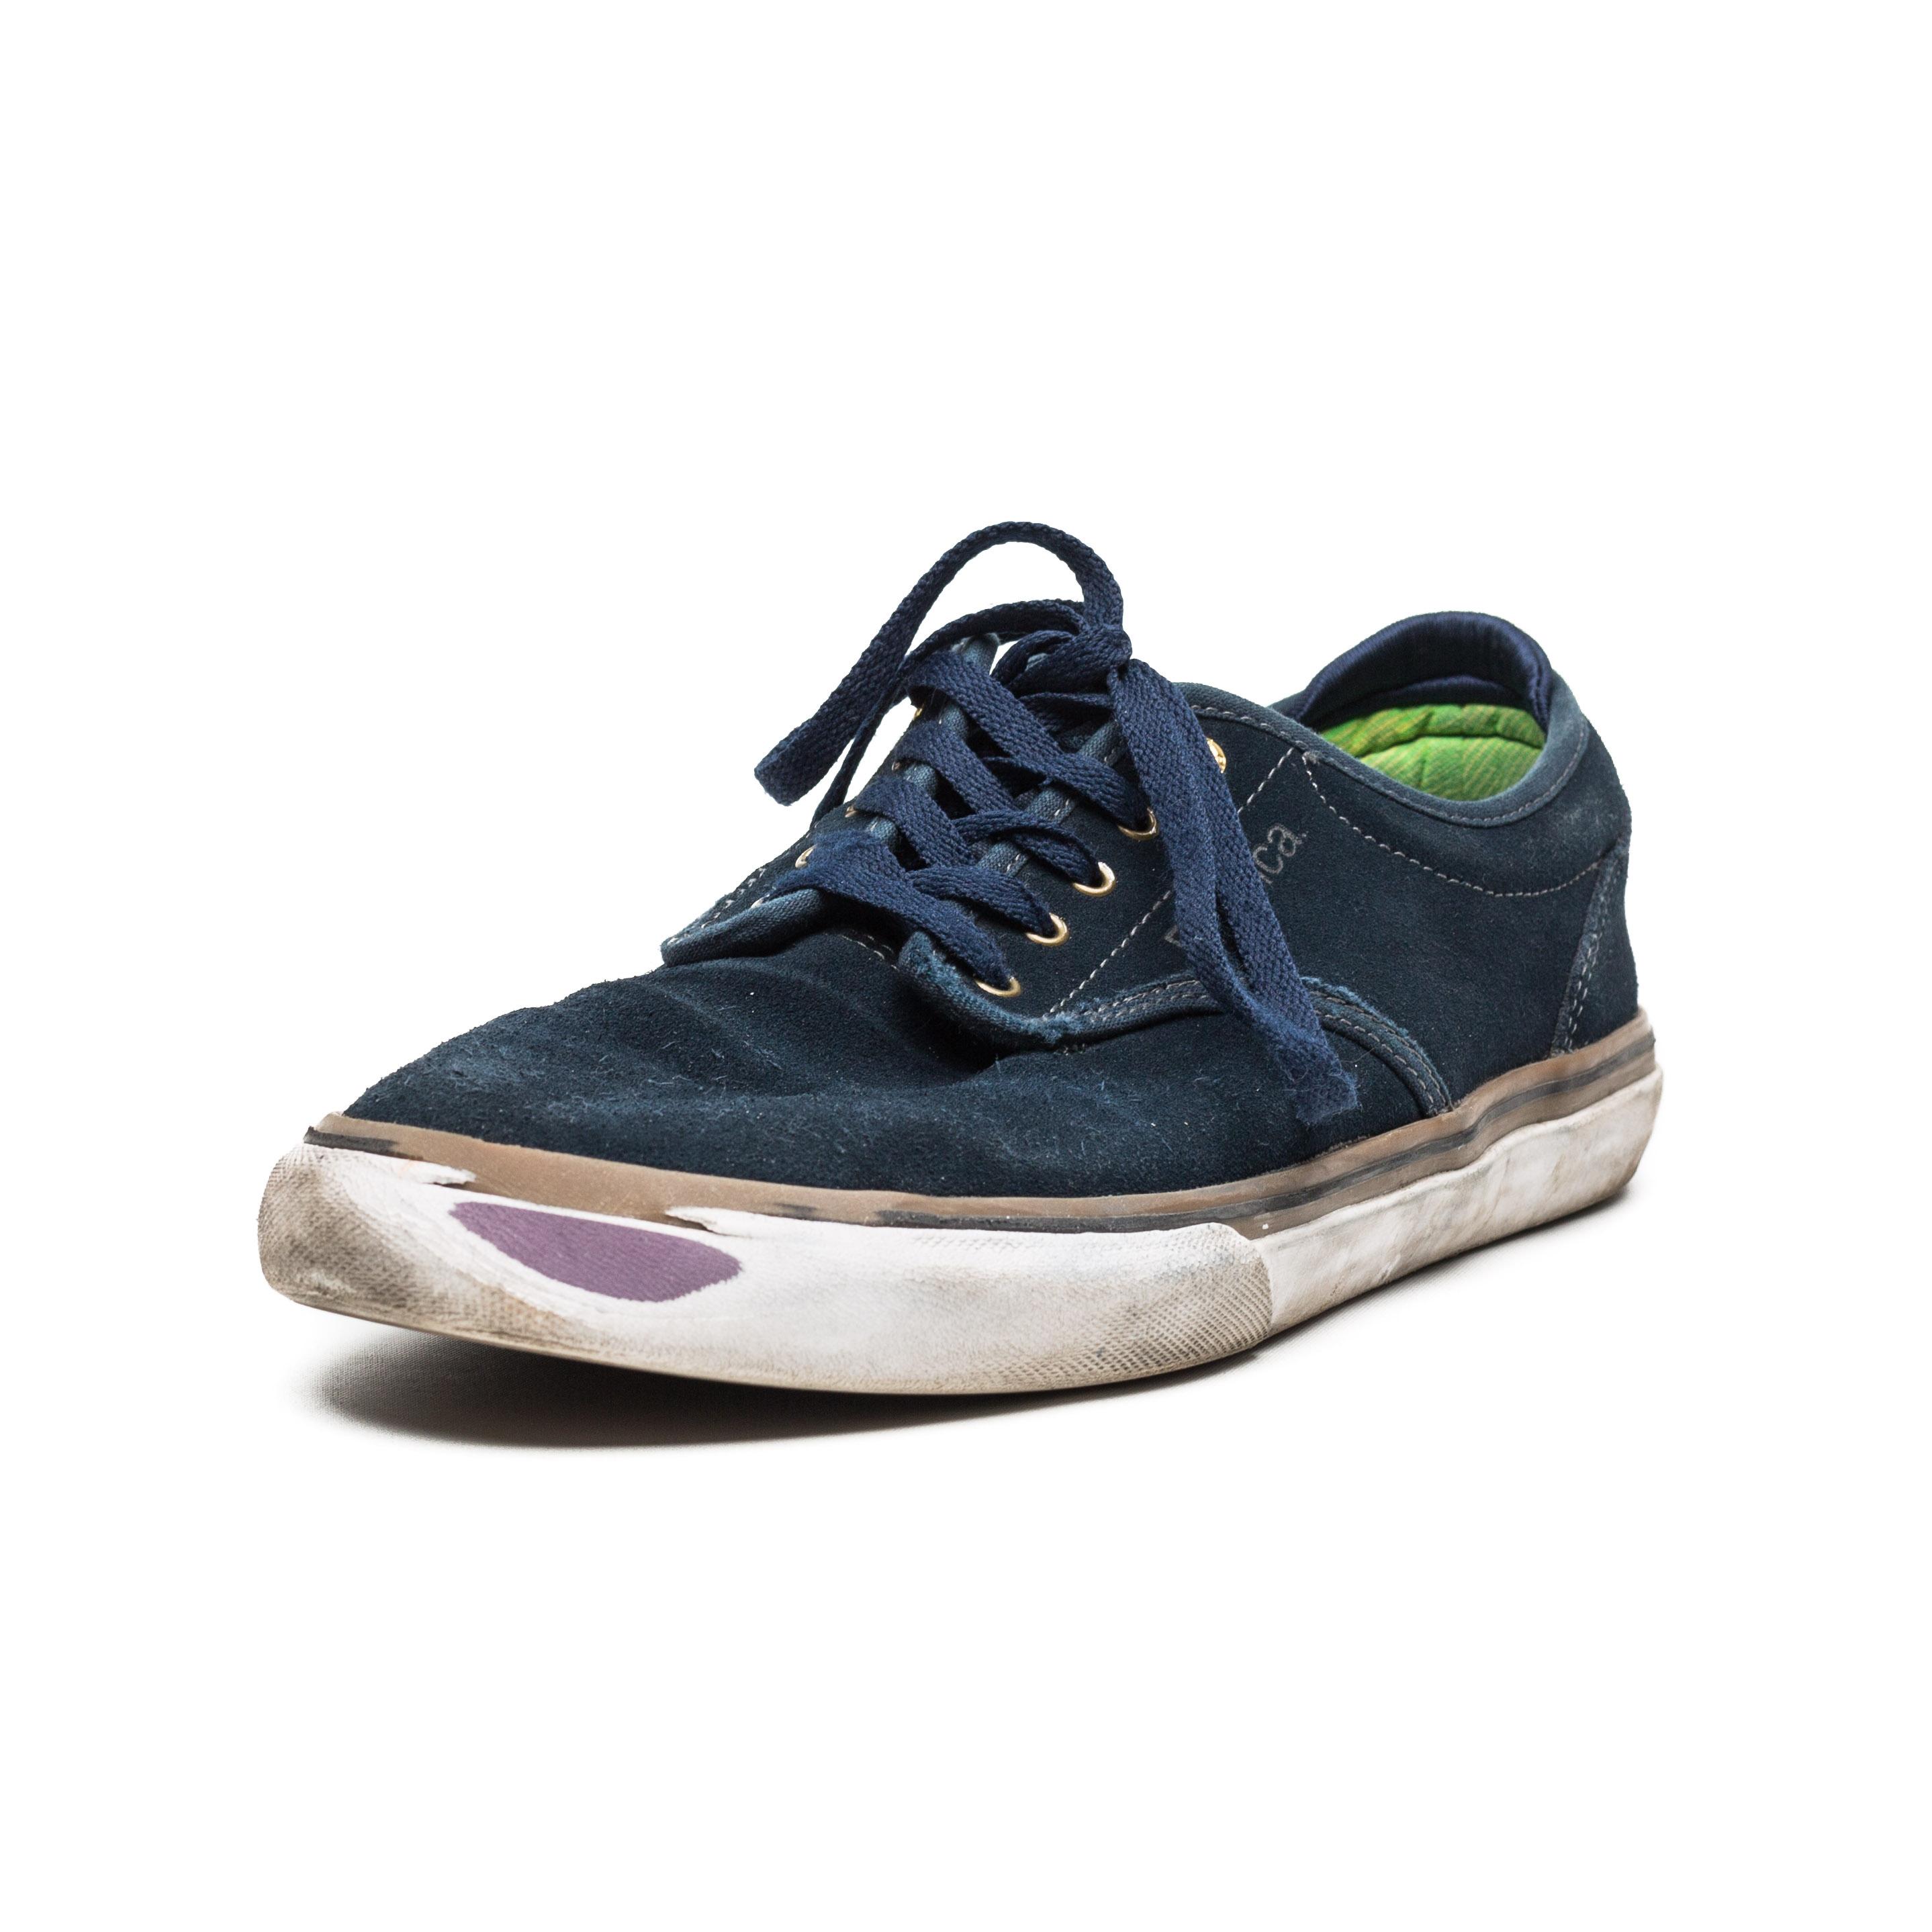 f3a6dd2e6d3 Emerica Wino G6 - Weartested - detailed skate shoe reviews